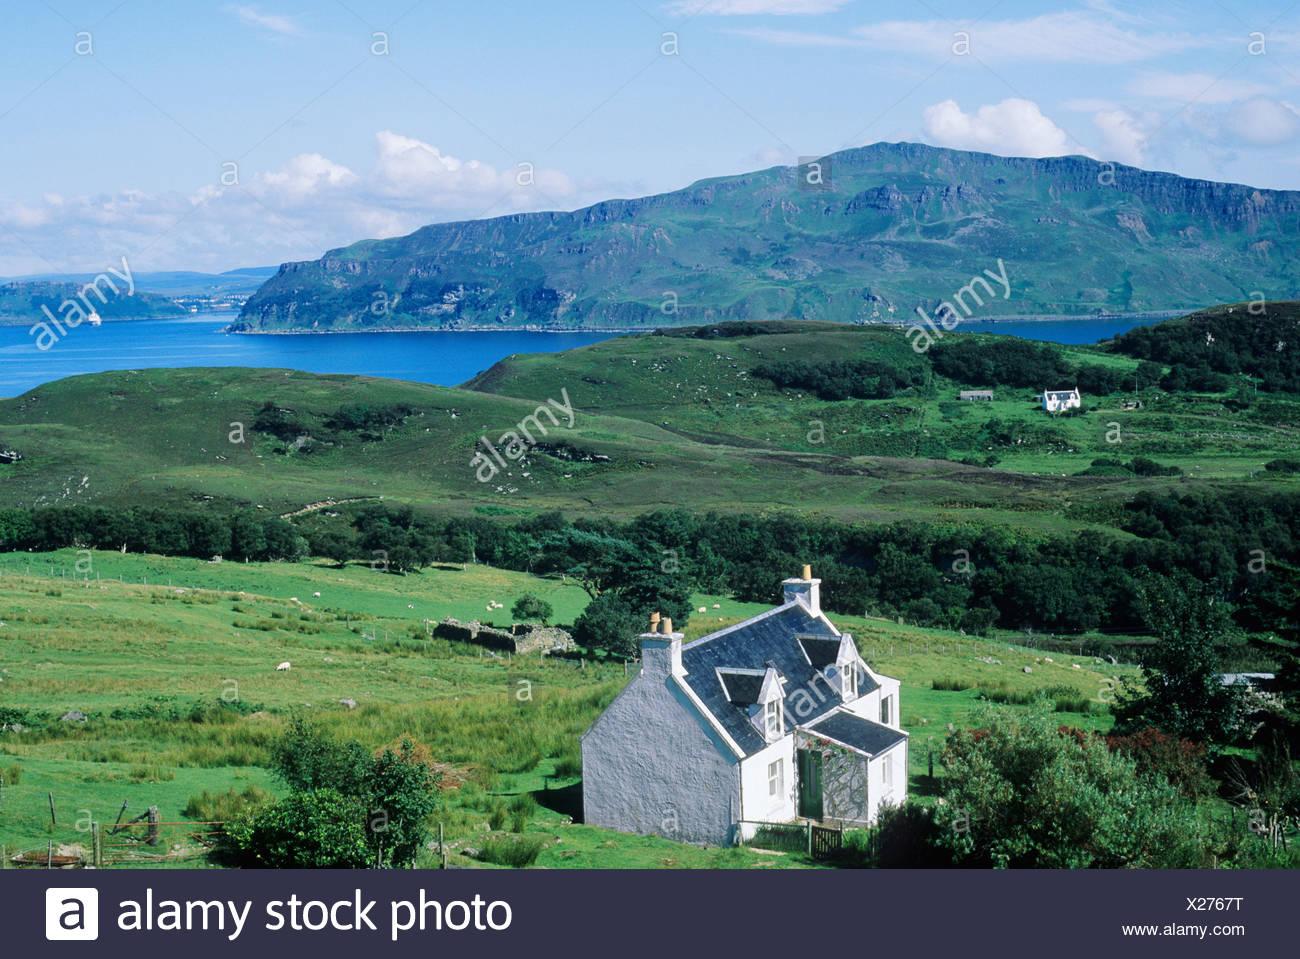 Isle of Raasay, view over Balachuirn Hamlet to Skye, Scotland Scottish island islands coast coastal scenery landscape UK isles - Stock Image